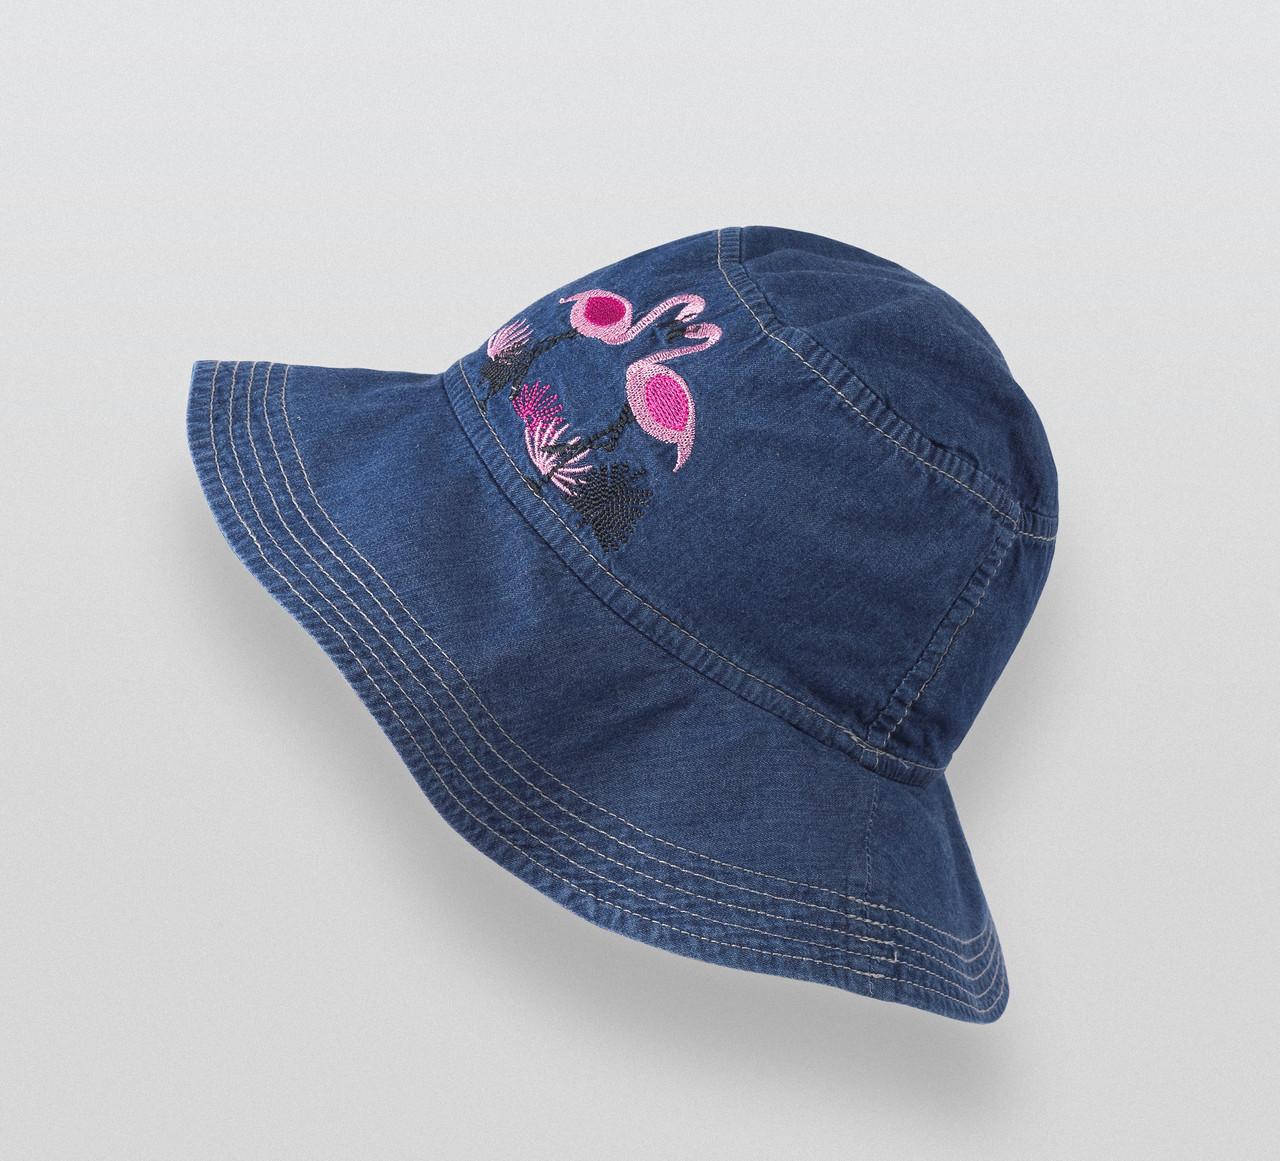 Джинсовая панама для девочки Бемби Фламинго (р.46/50, 50/52)